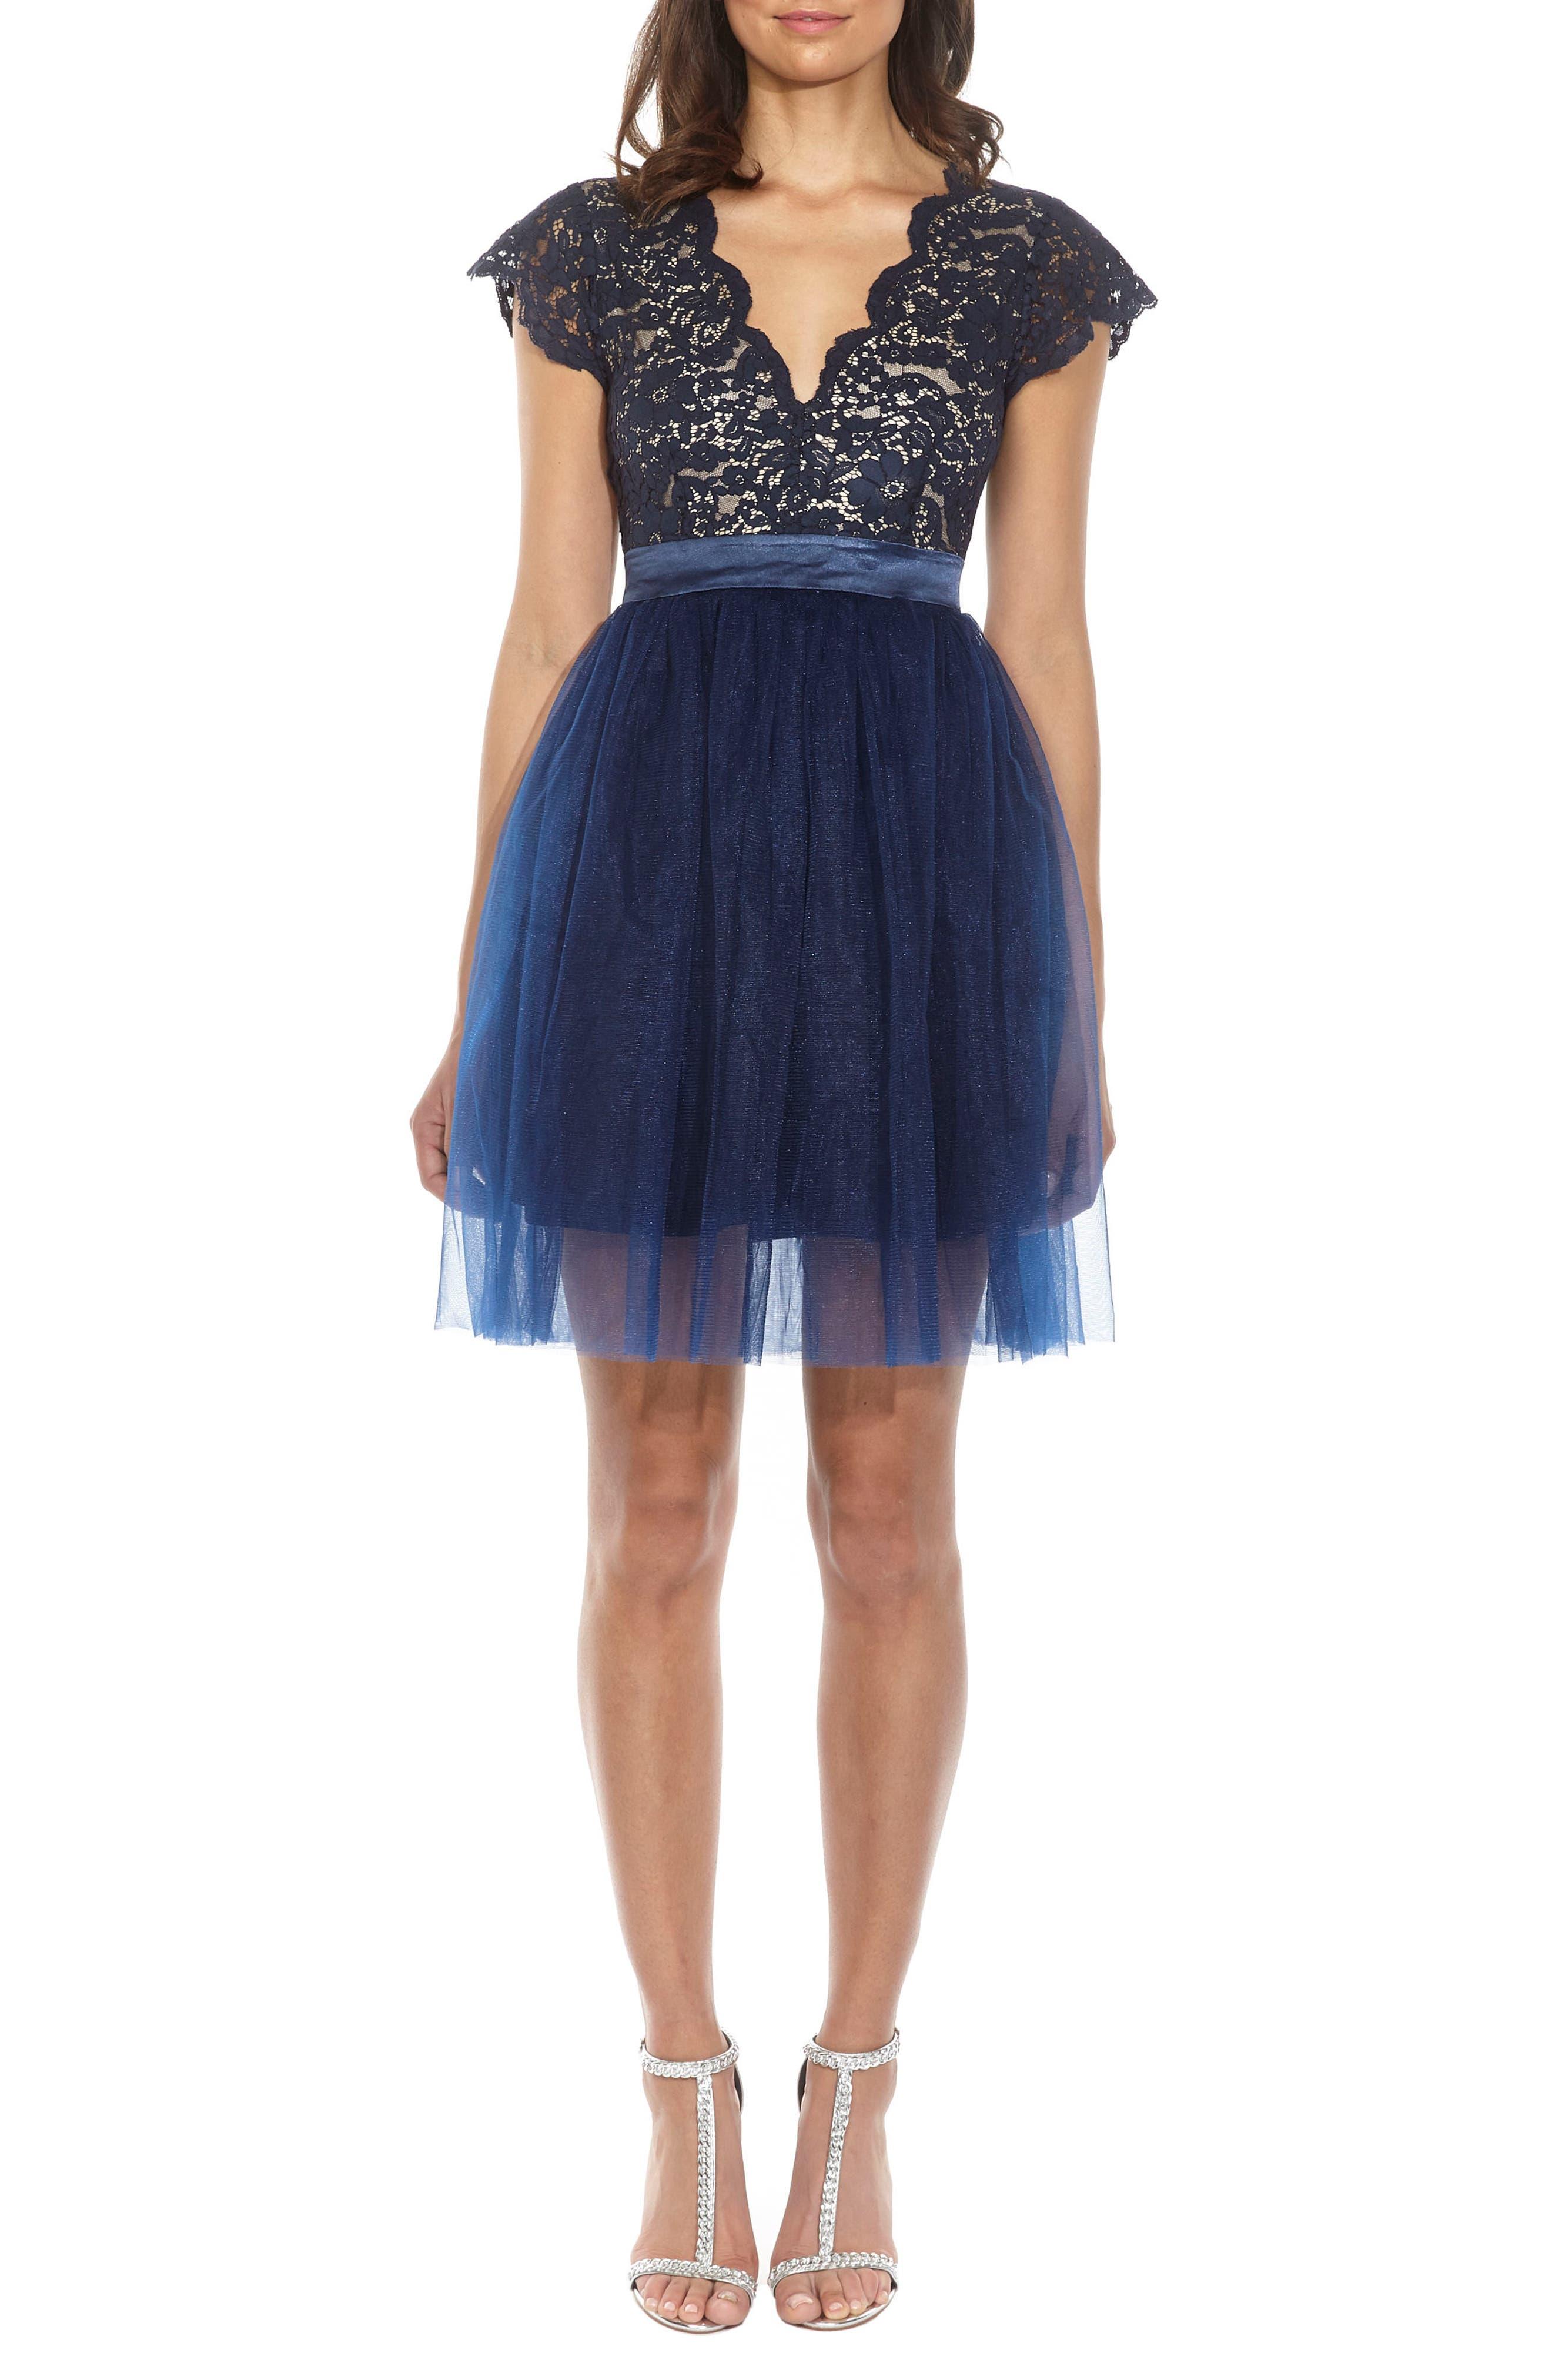 Macen Scalloped Lace Skater Dress,                             Main thumbnail 1, color,                             410